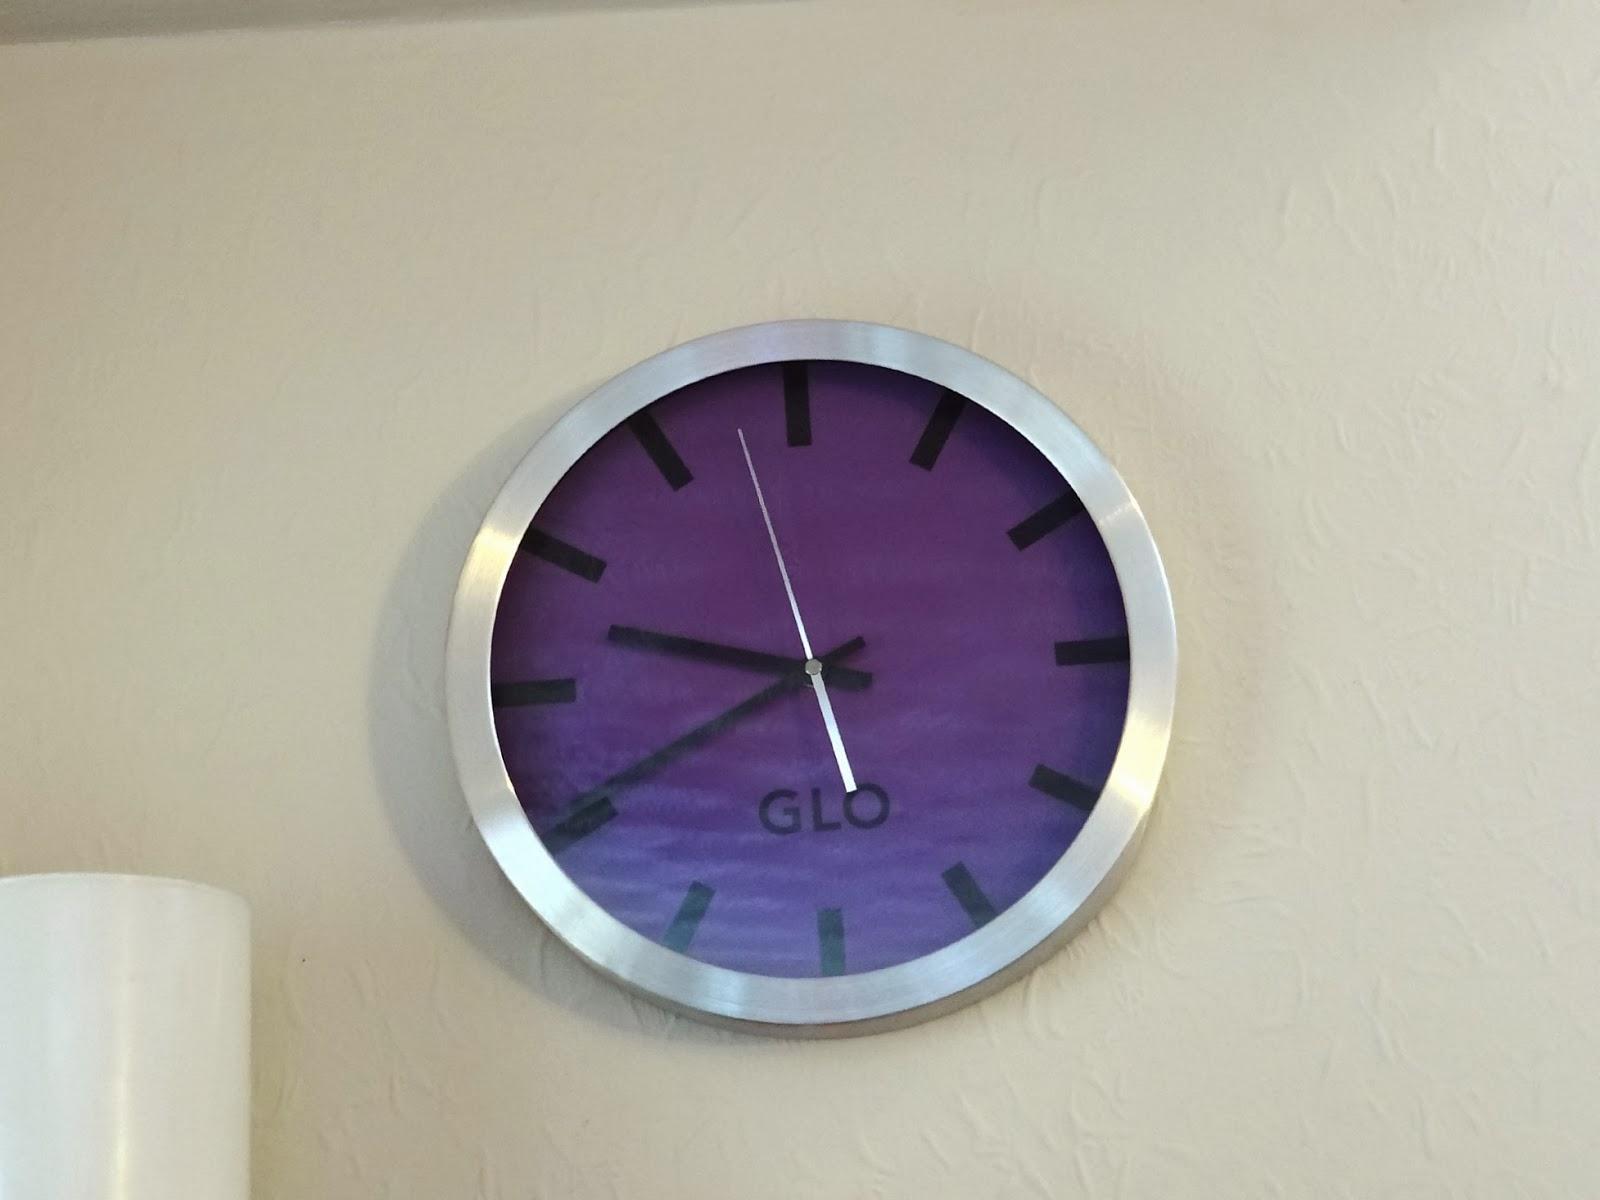 GLO Aluminium Wall Clock, Shoplet Office Supplies, Modern Wall Clock